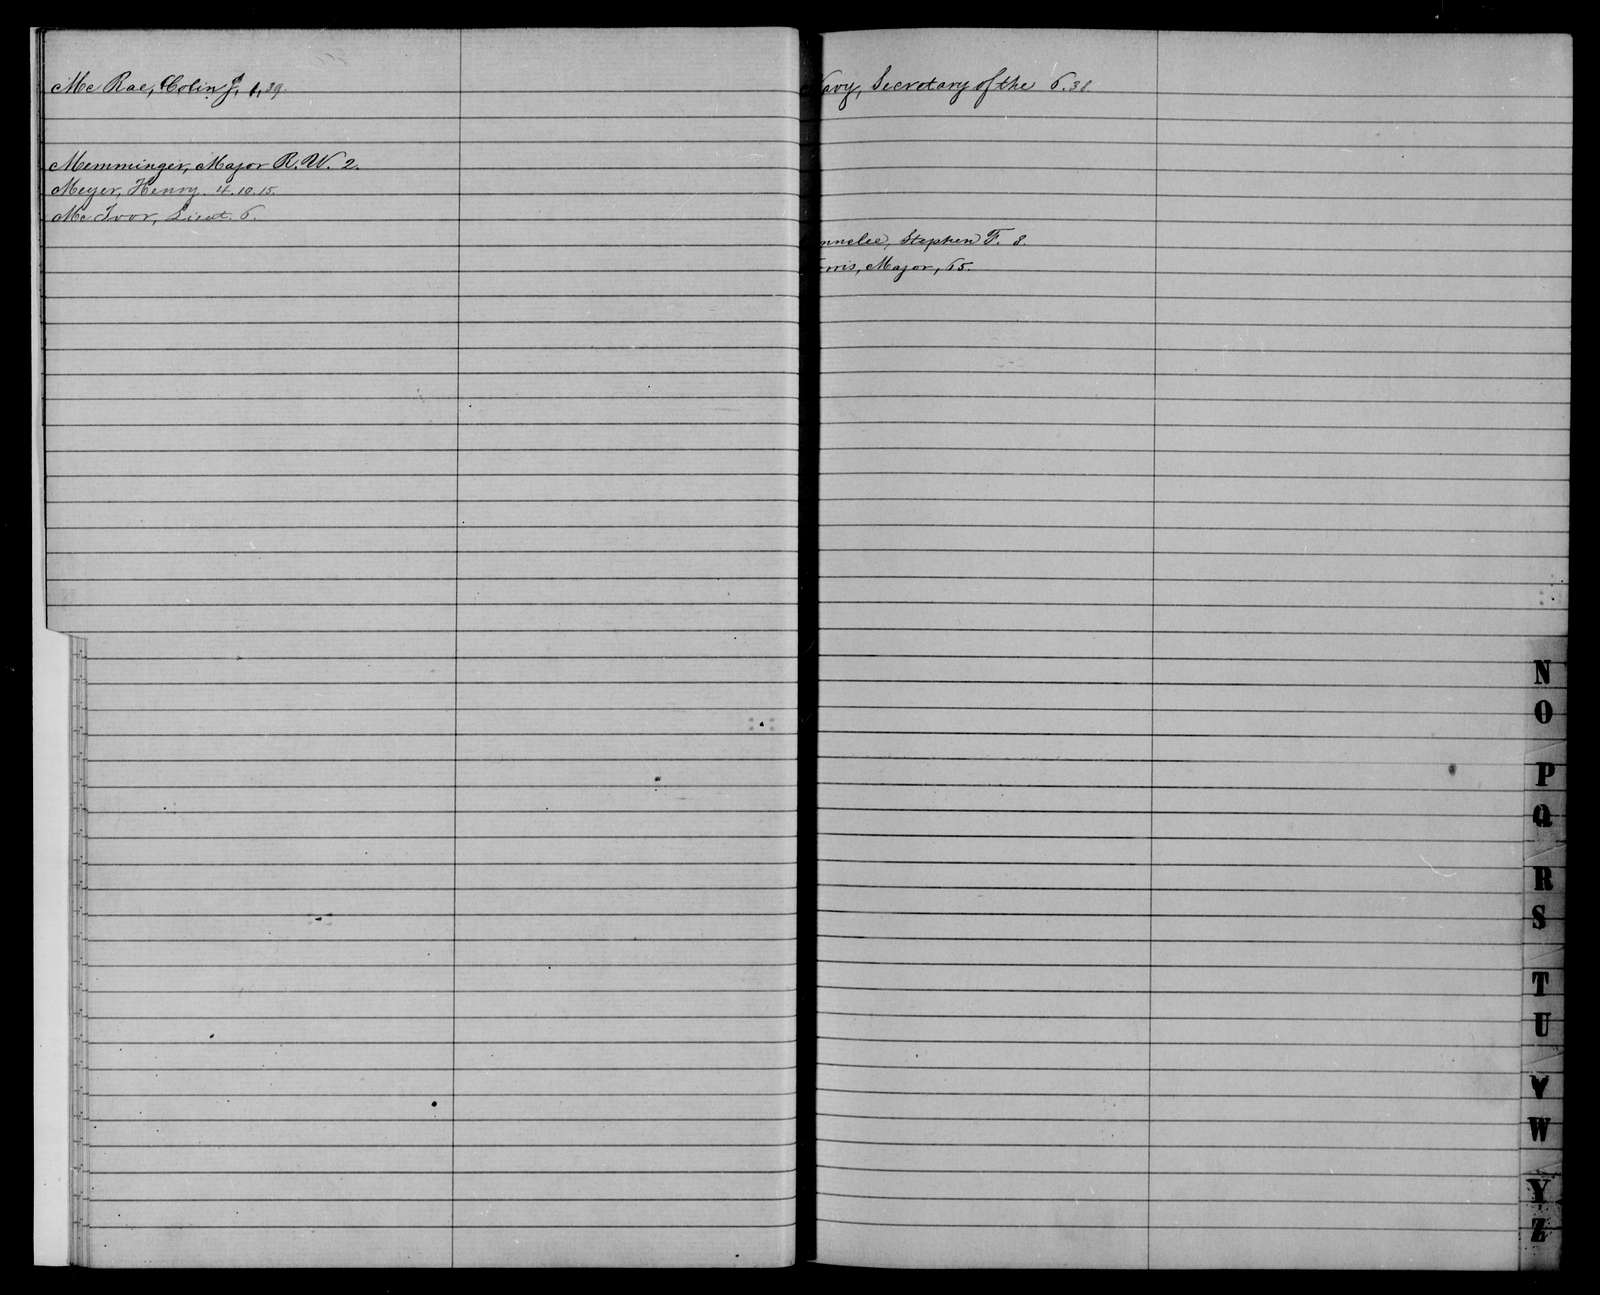 Confederate States of America records: Microfilm Reel 13